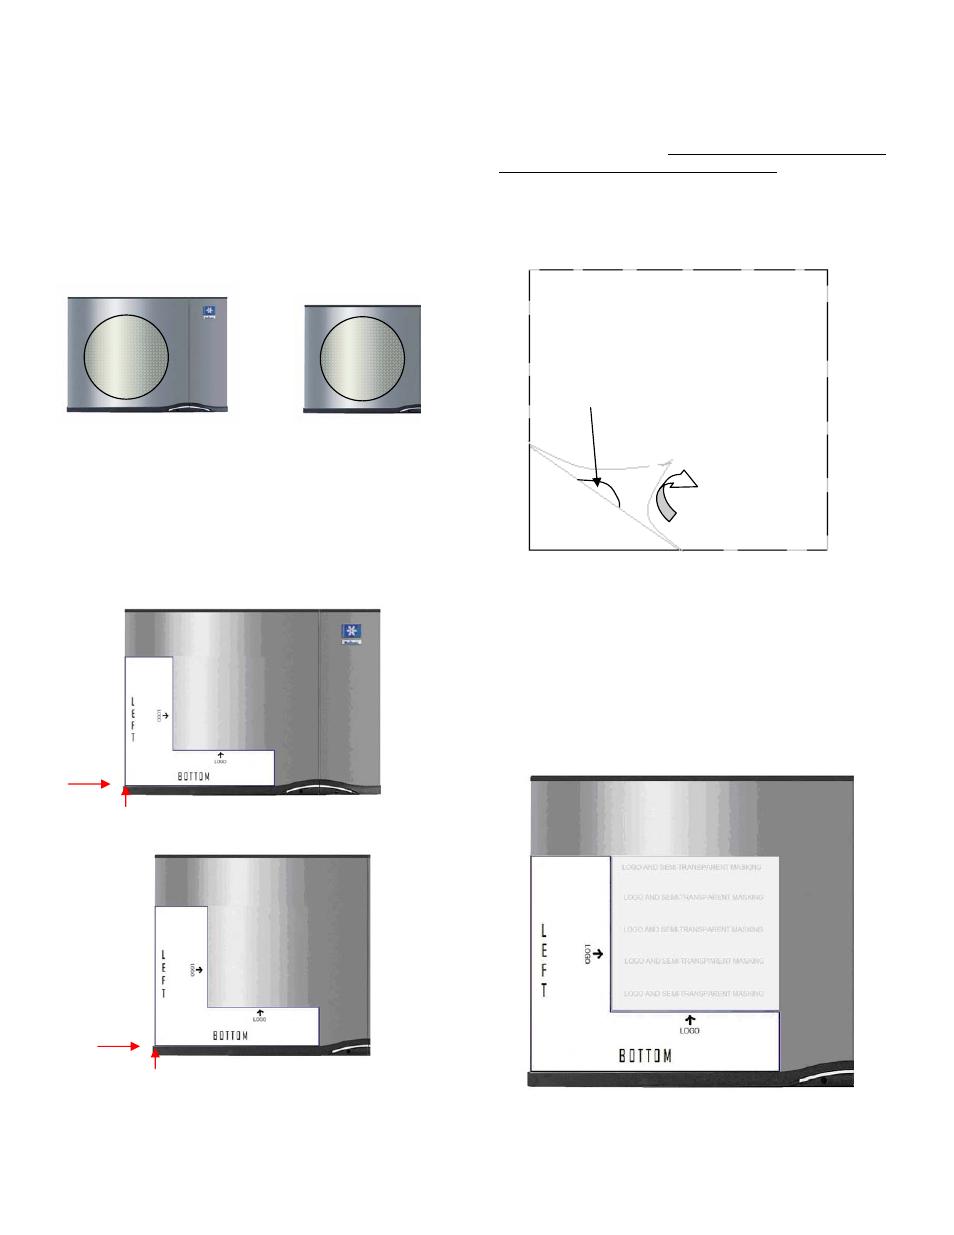 Manitowoc Ice S1470c User Manual Manual Guide